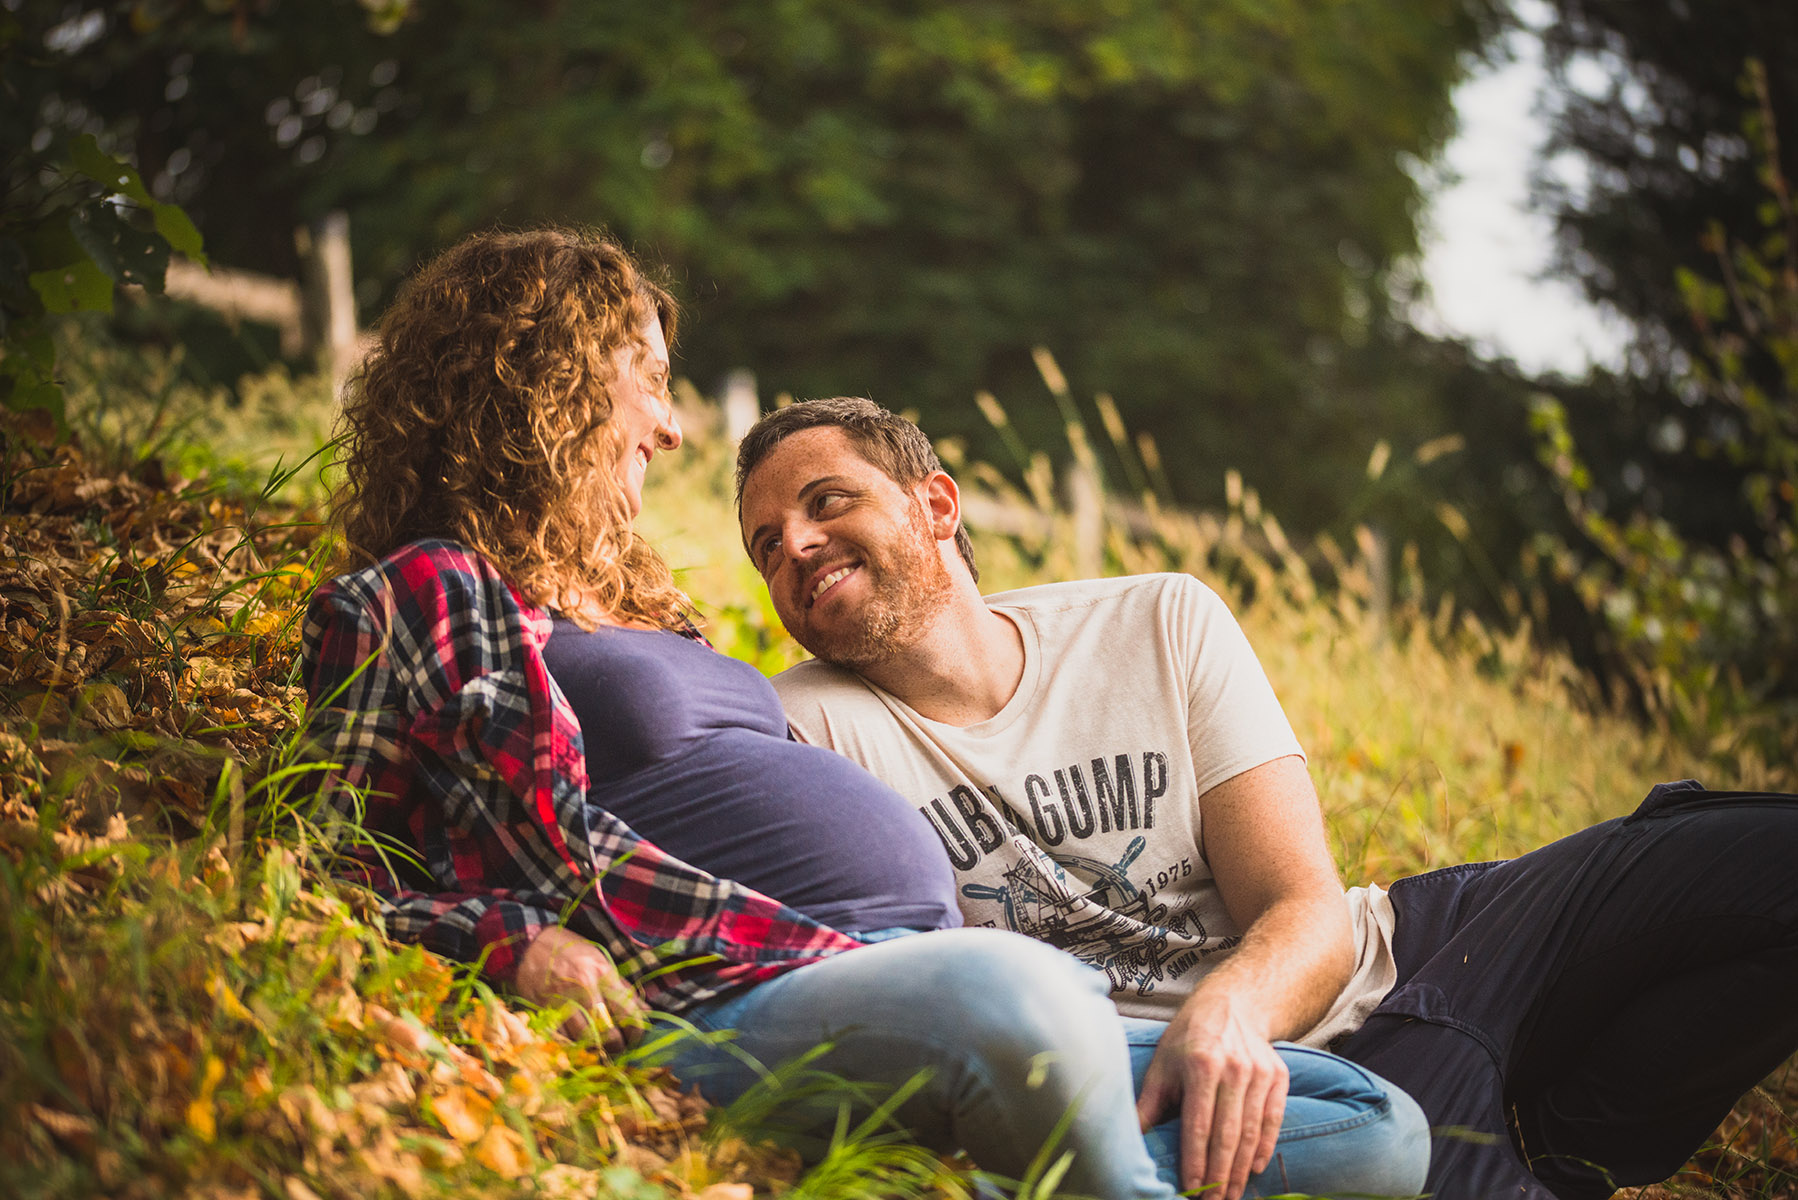 pregnancy-photography-wedding-photography-bedfordshire-dunstable-luton (13).jpg